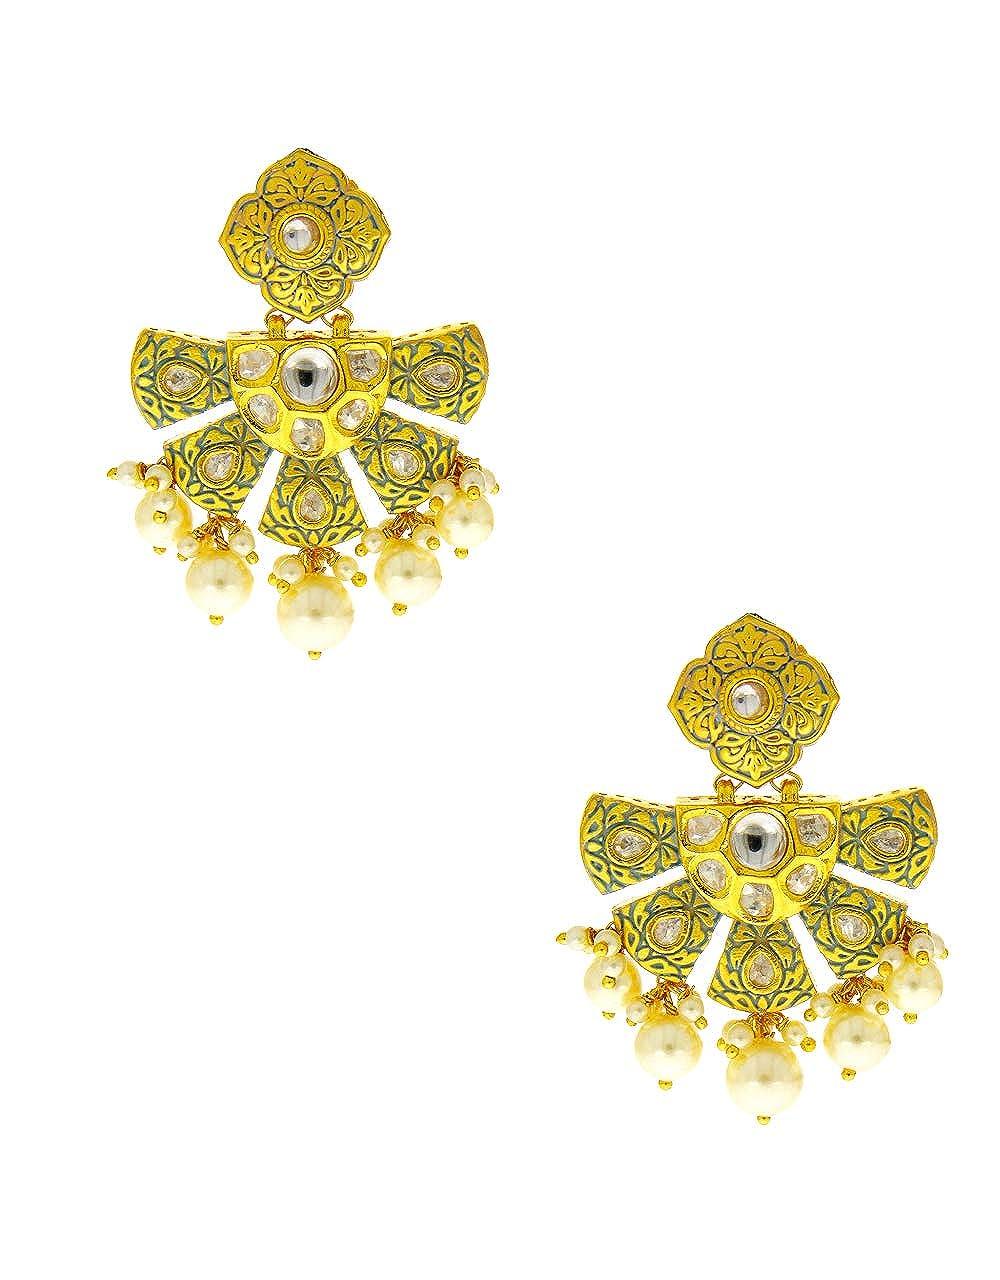 E3539 925 Sterling Silver, Children Earrings Sandal Ear Studs with Crystal Stones